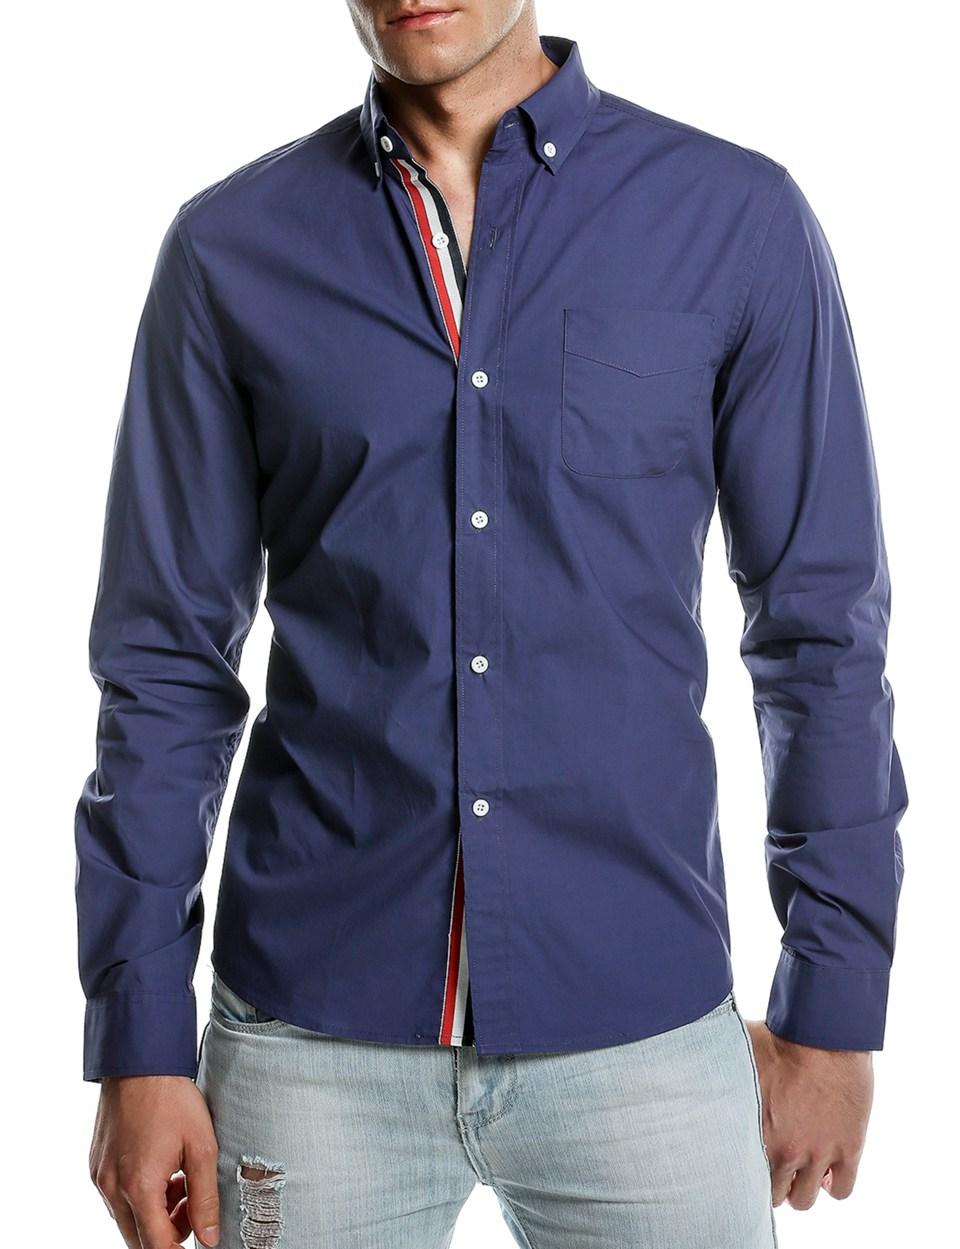 shirt (12)